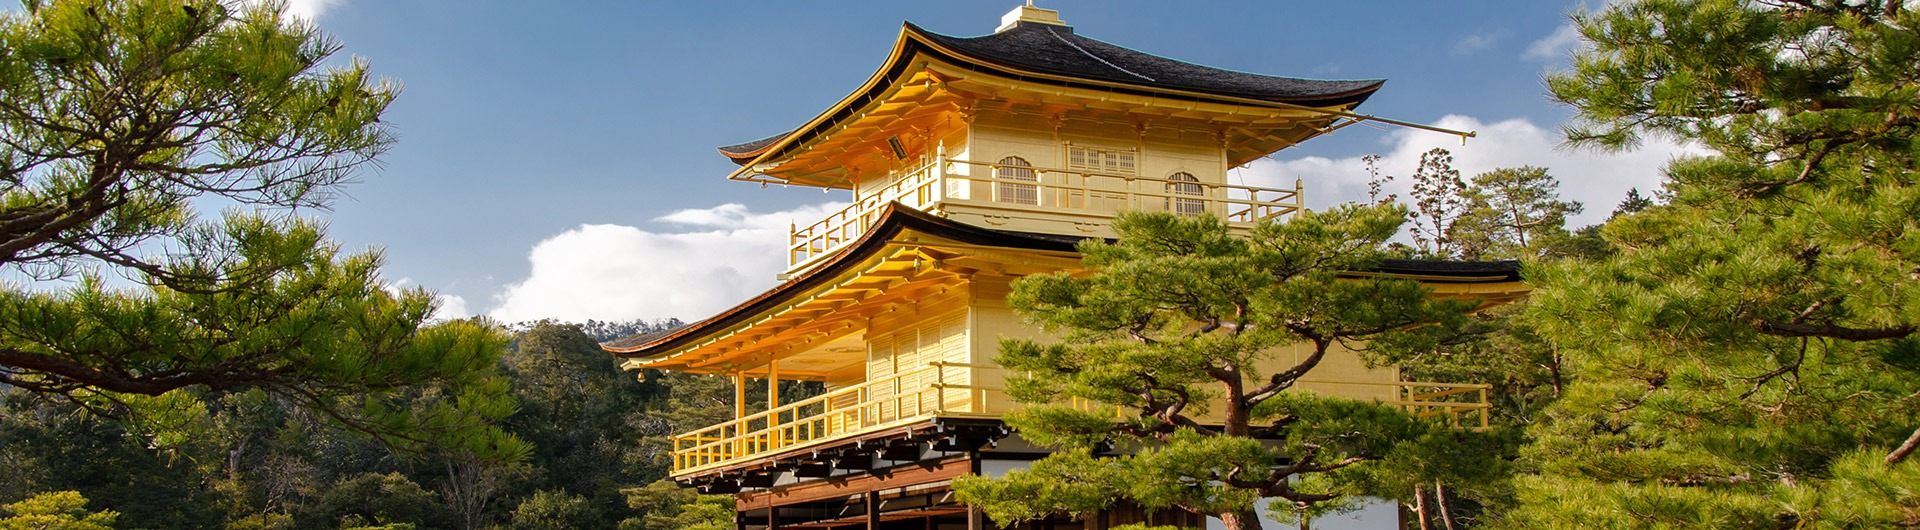 Kinkaku-ji (the Golden Temple) in Kyoto, Japan